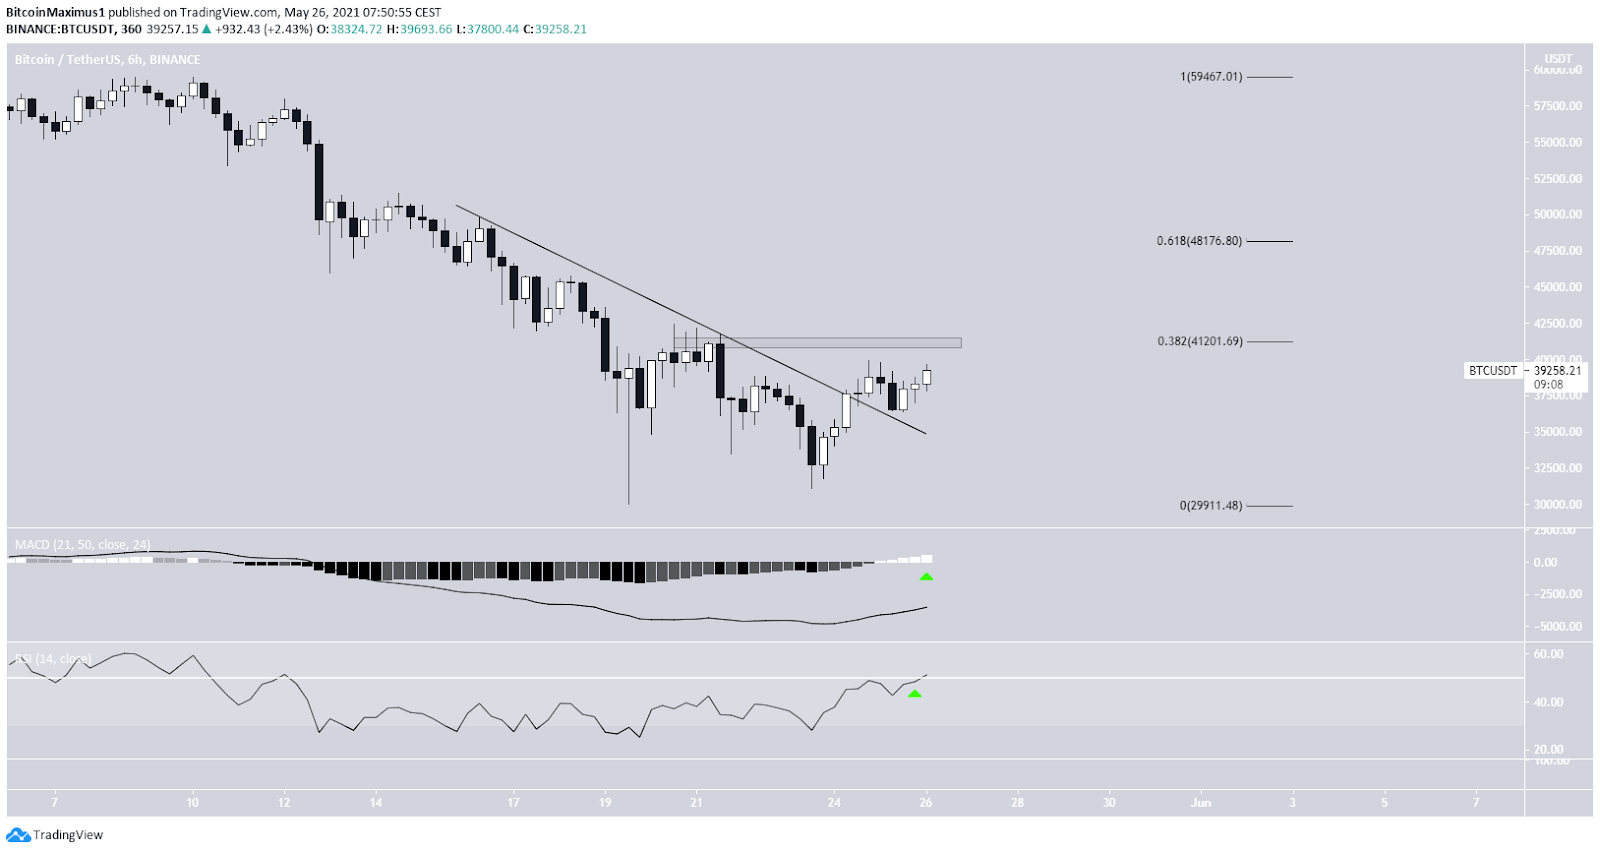 Bitcoin Kurs Preis 6-Stunden-Chart 26.05.2021